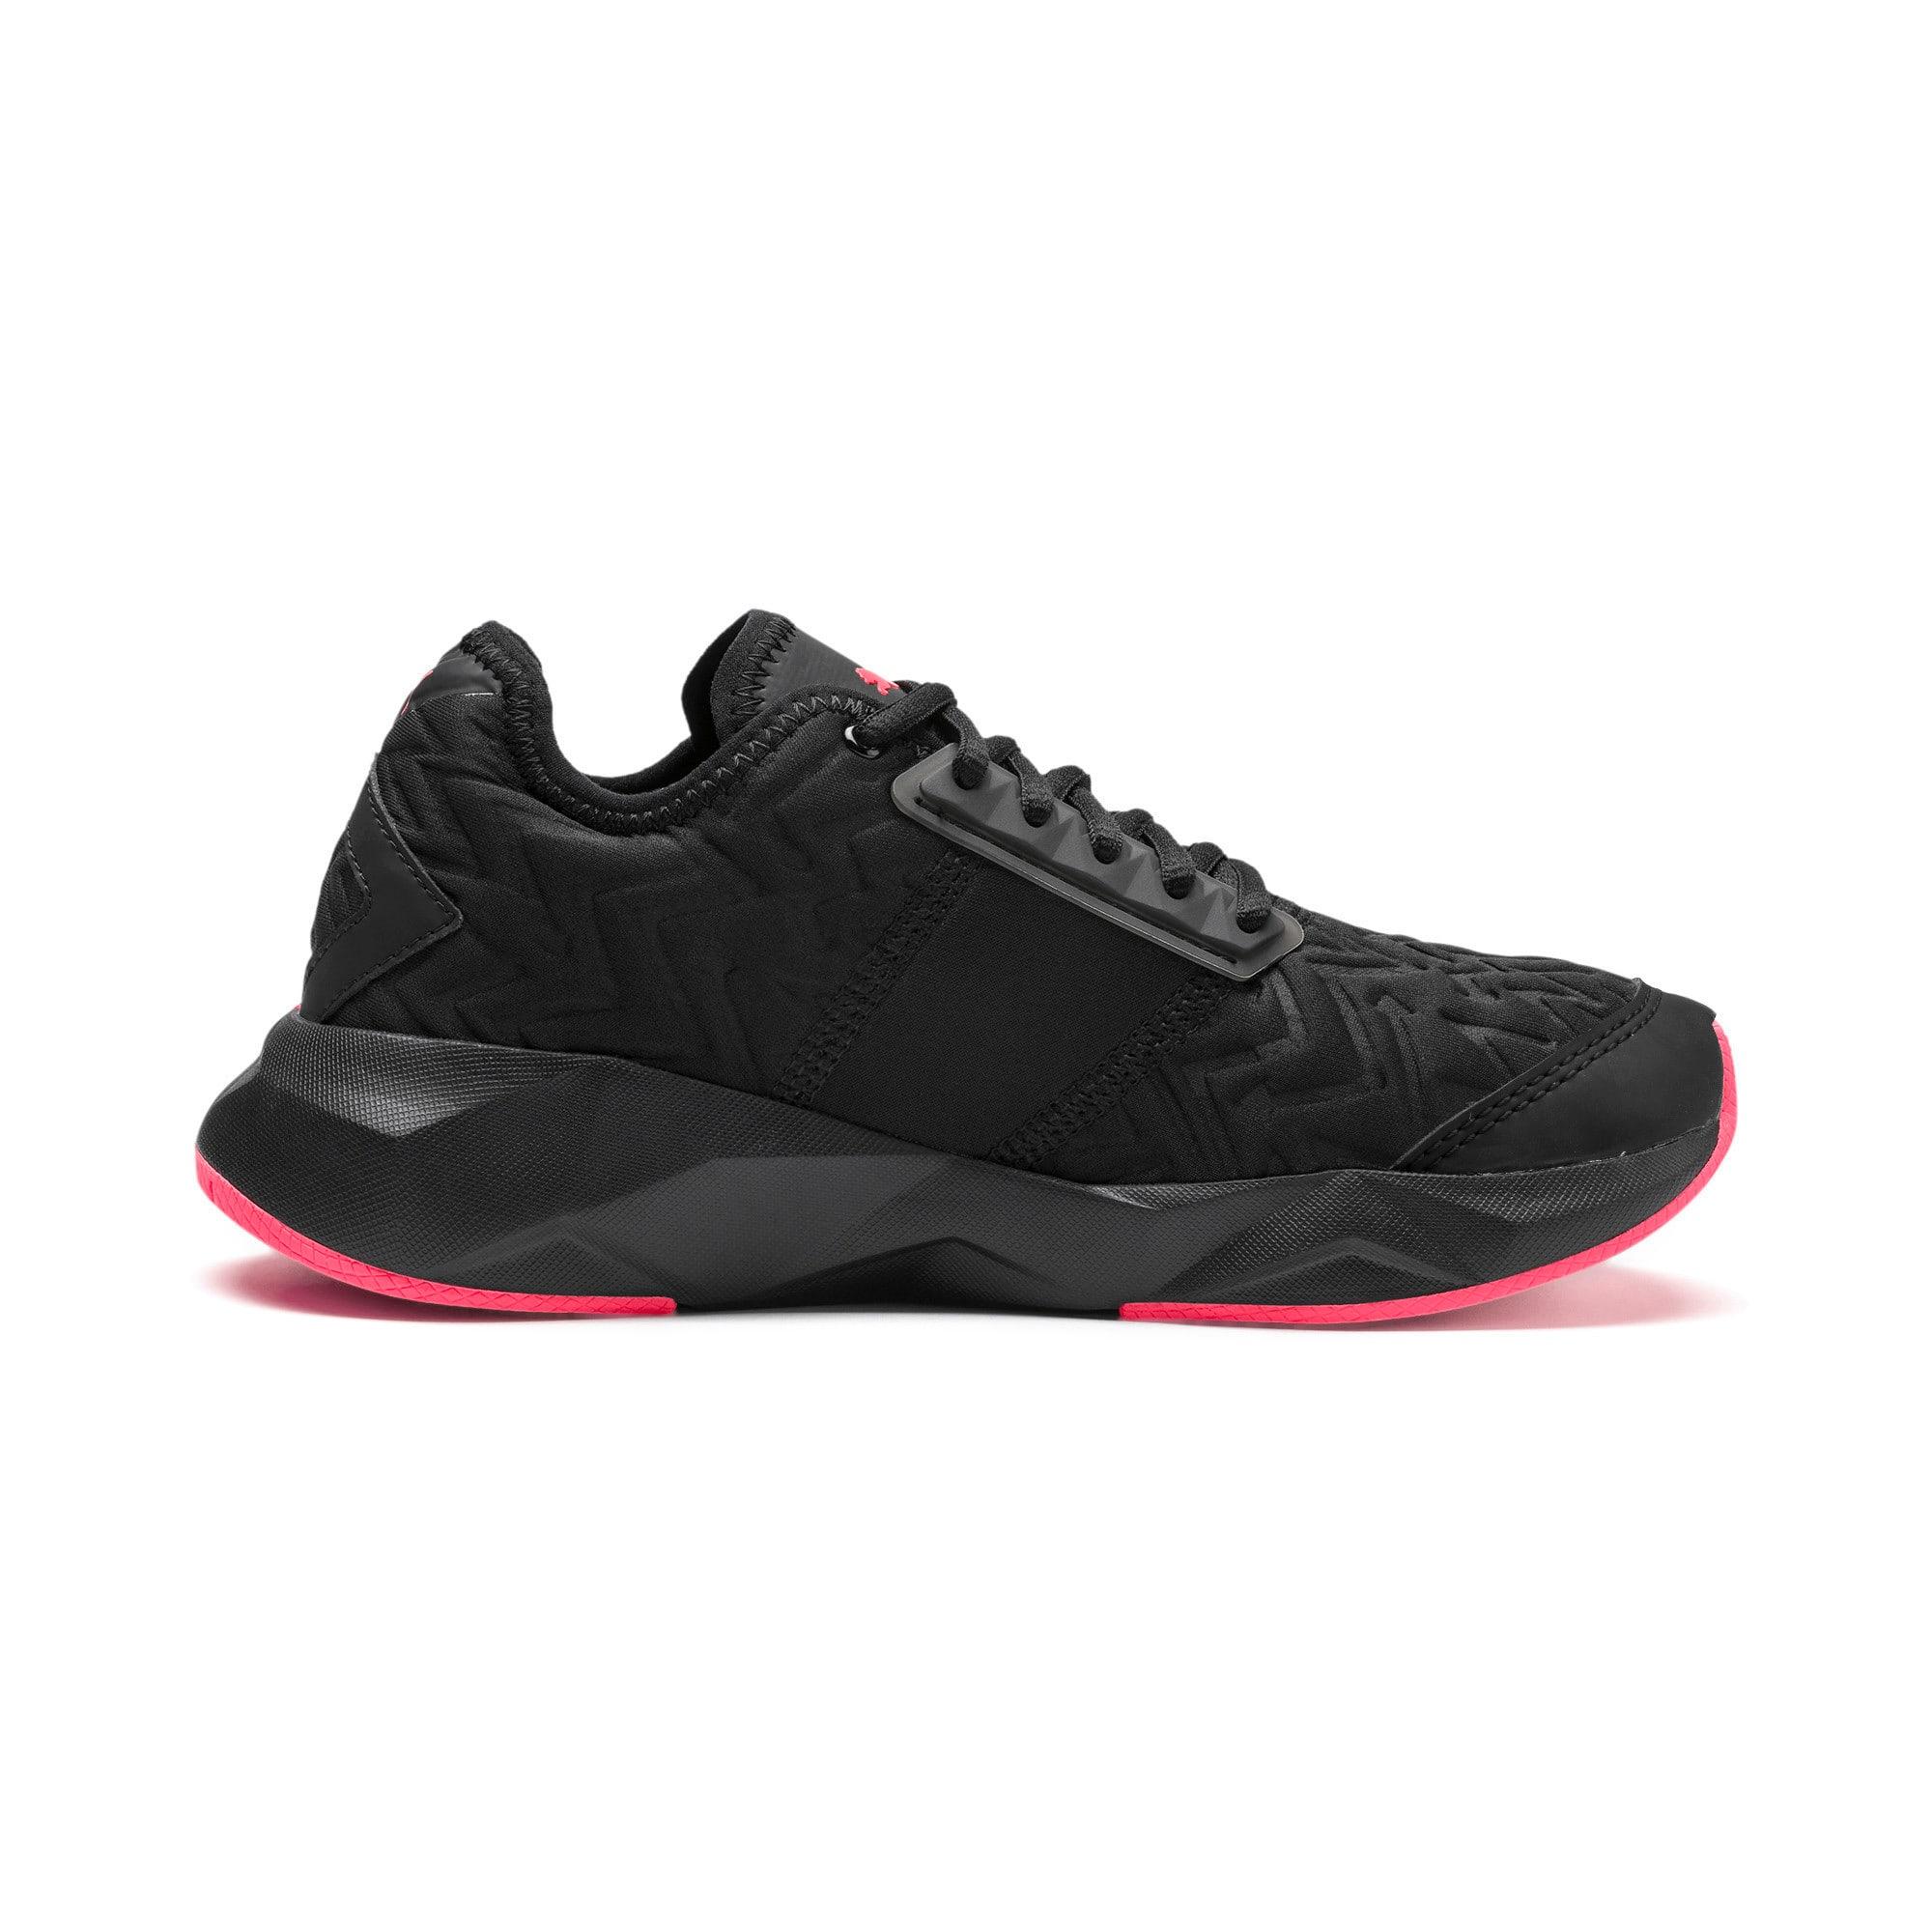 Thumbnail 5 of CELL Plasmic Fluorescent Women's Training Shoes, Puma Black-Pink Alert, medium